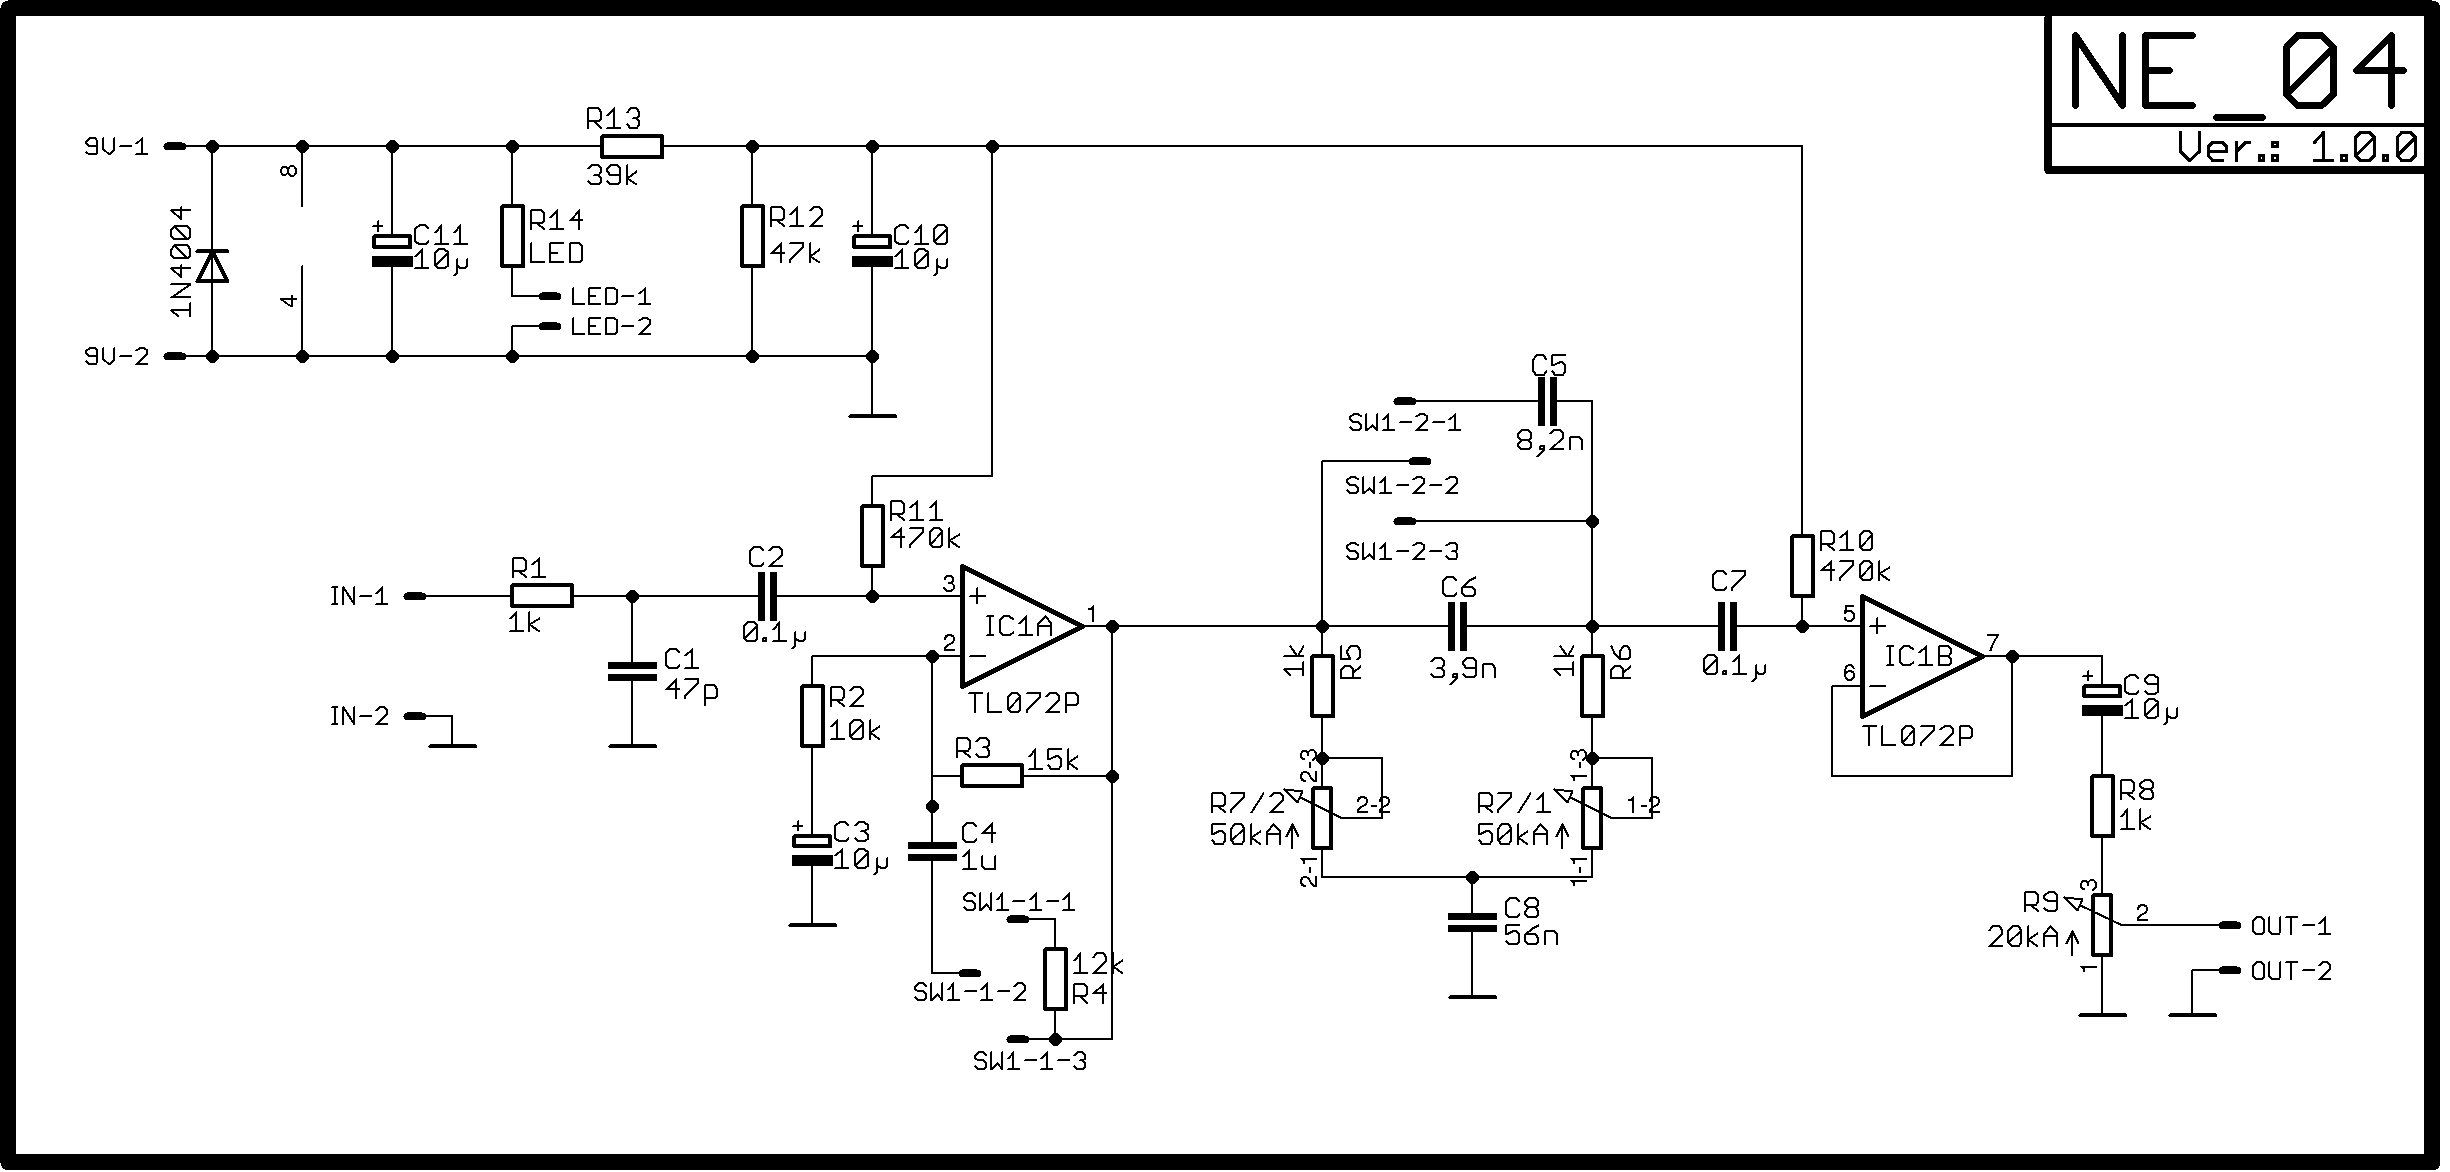 NE_04 Schaltplan